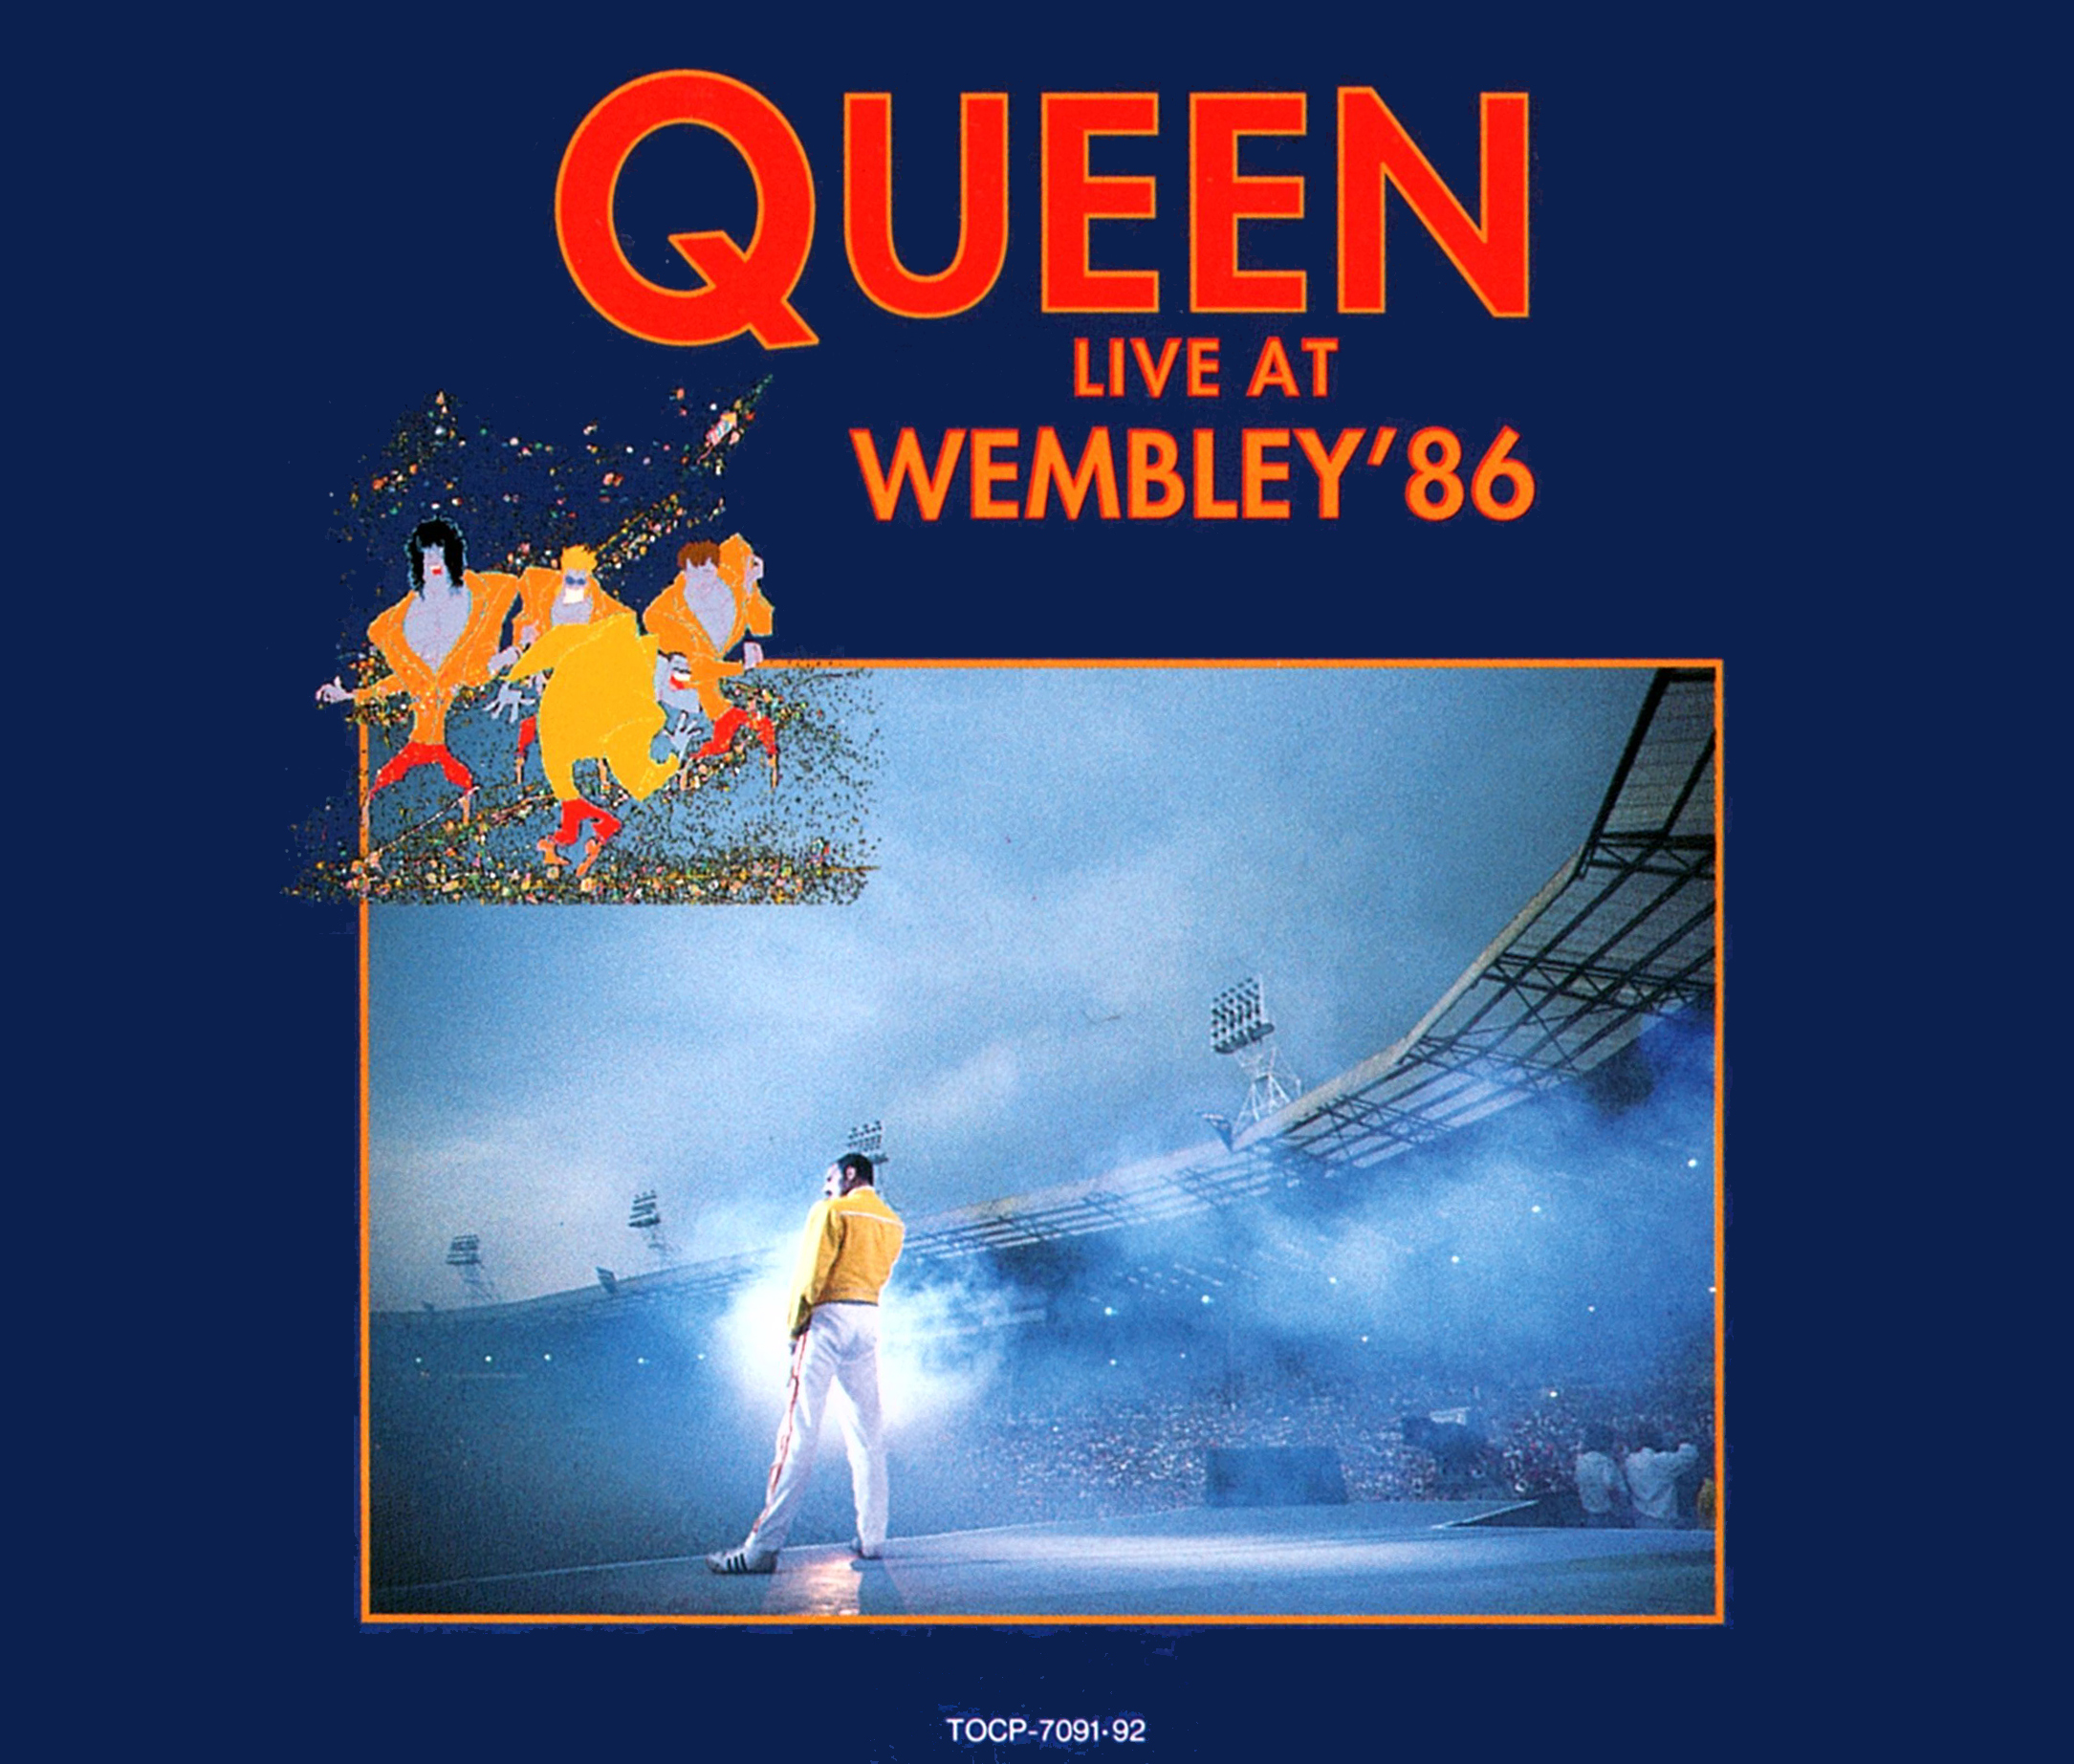 Queen (クイーン) ライブ・アルバム『Live At Wembley Stadium (クイーン・ライヴ!!ウェンブリー1986)』(1992年6月24日発売) 高画質CDジャケット画像